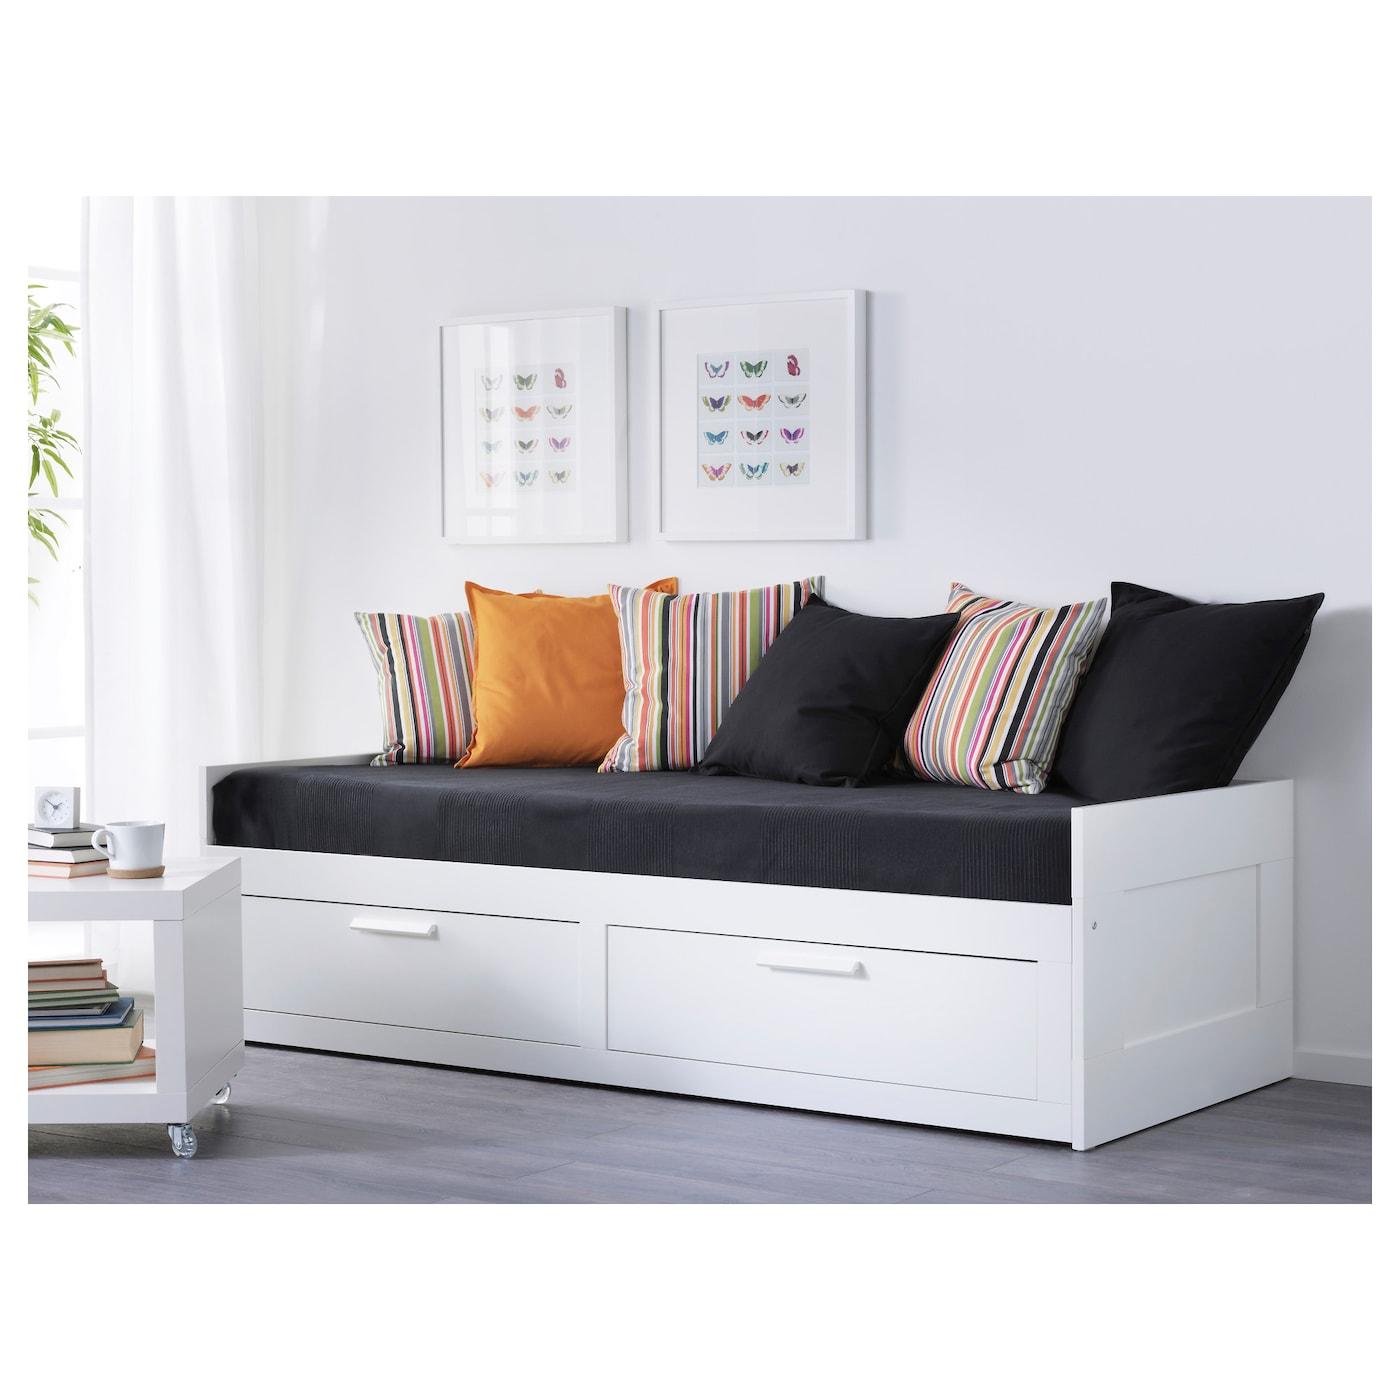 BRIMNES Day bed w 2 drawers2 mattresses whiteMoshult firm 80x200 cm